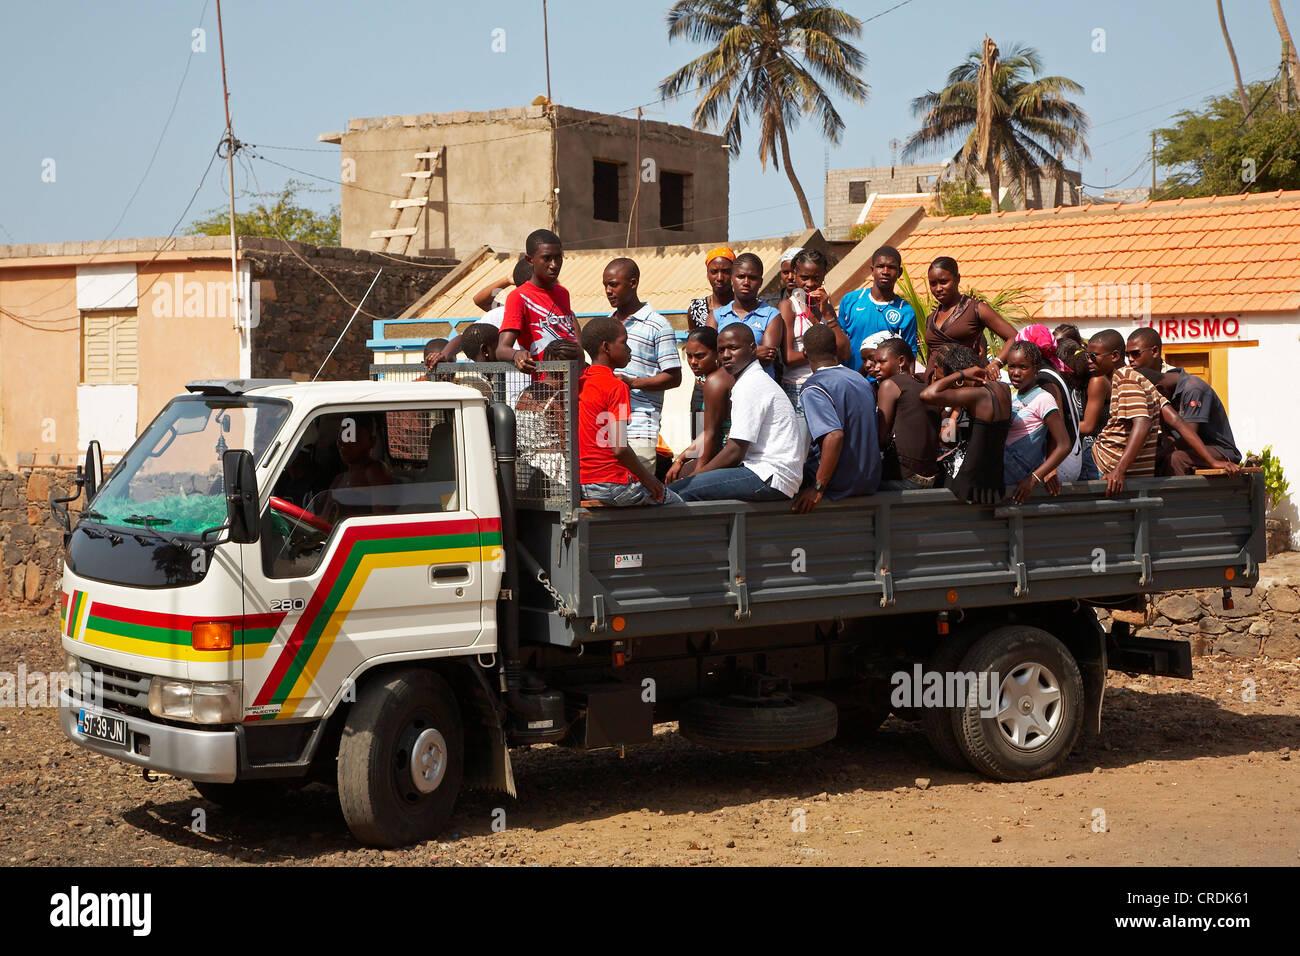 vehicle with several natives, Cap Verde Islands, Cabo Verde, island Santiago - Stock Image